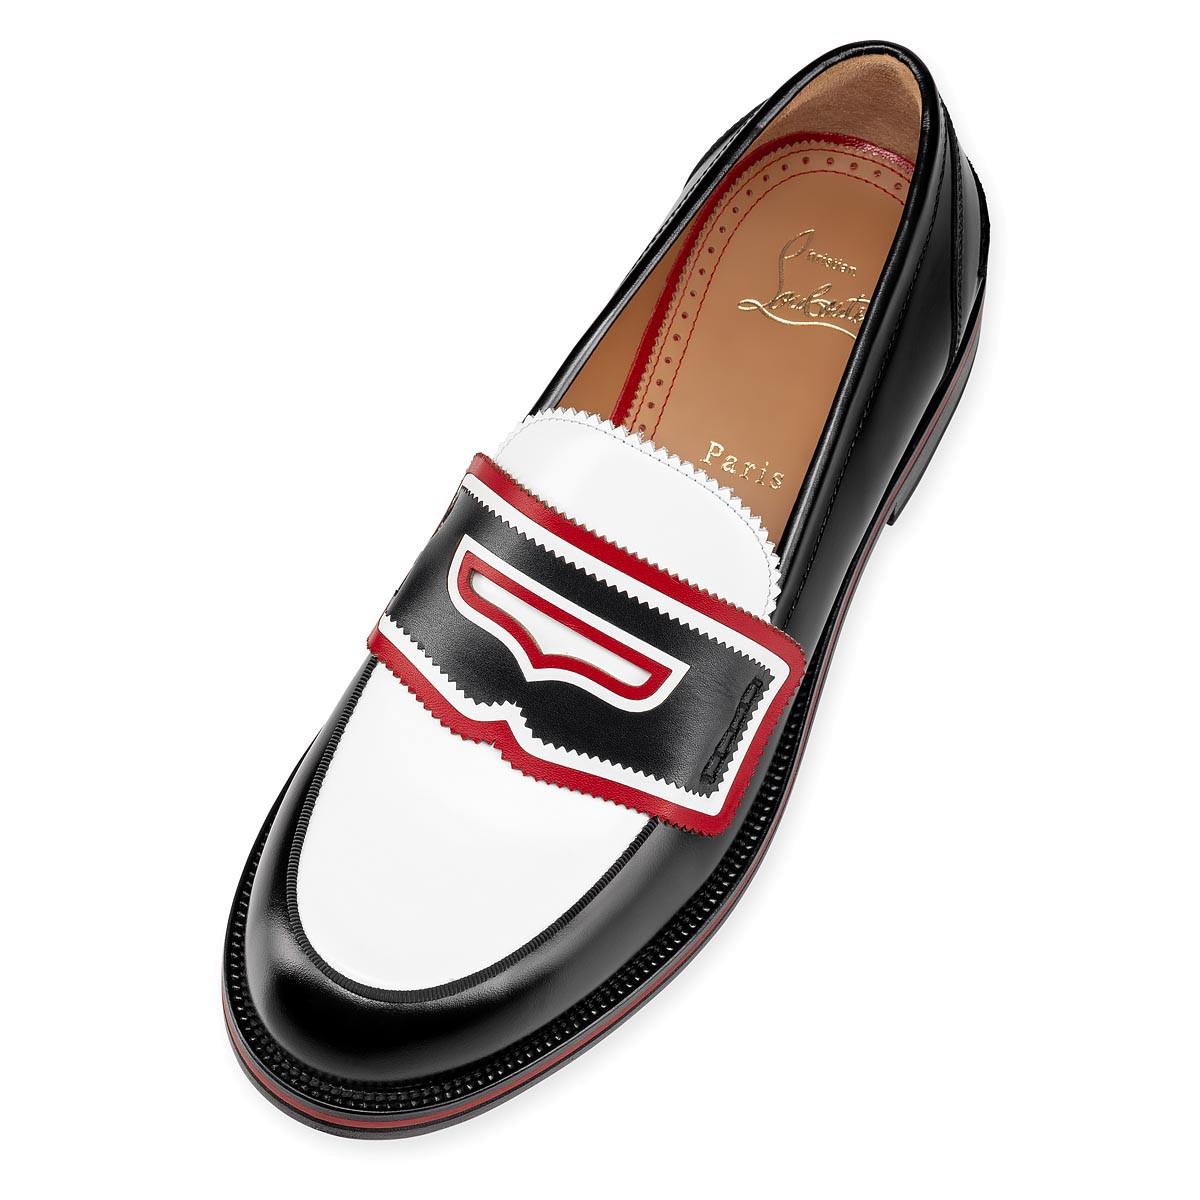 Shoes - Tricomoc Flat - Christian Louboutin